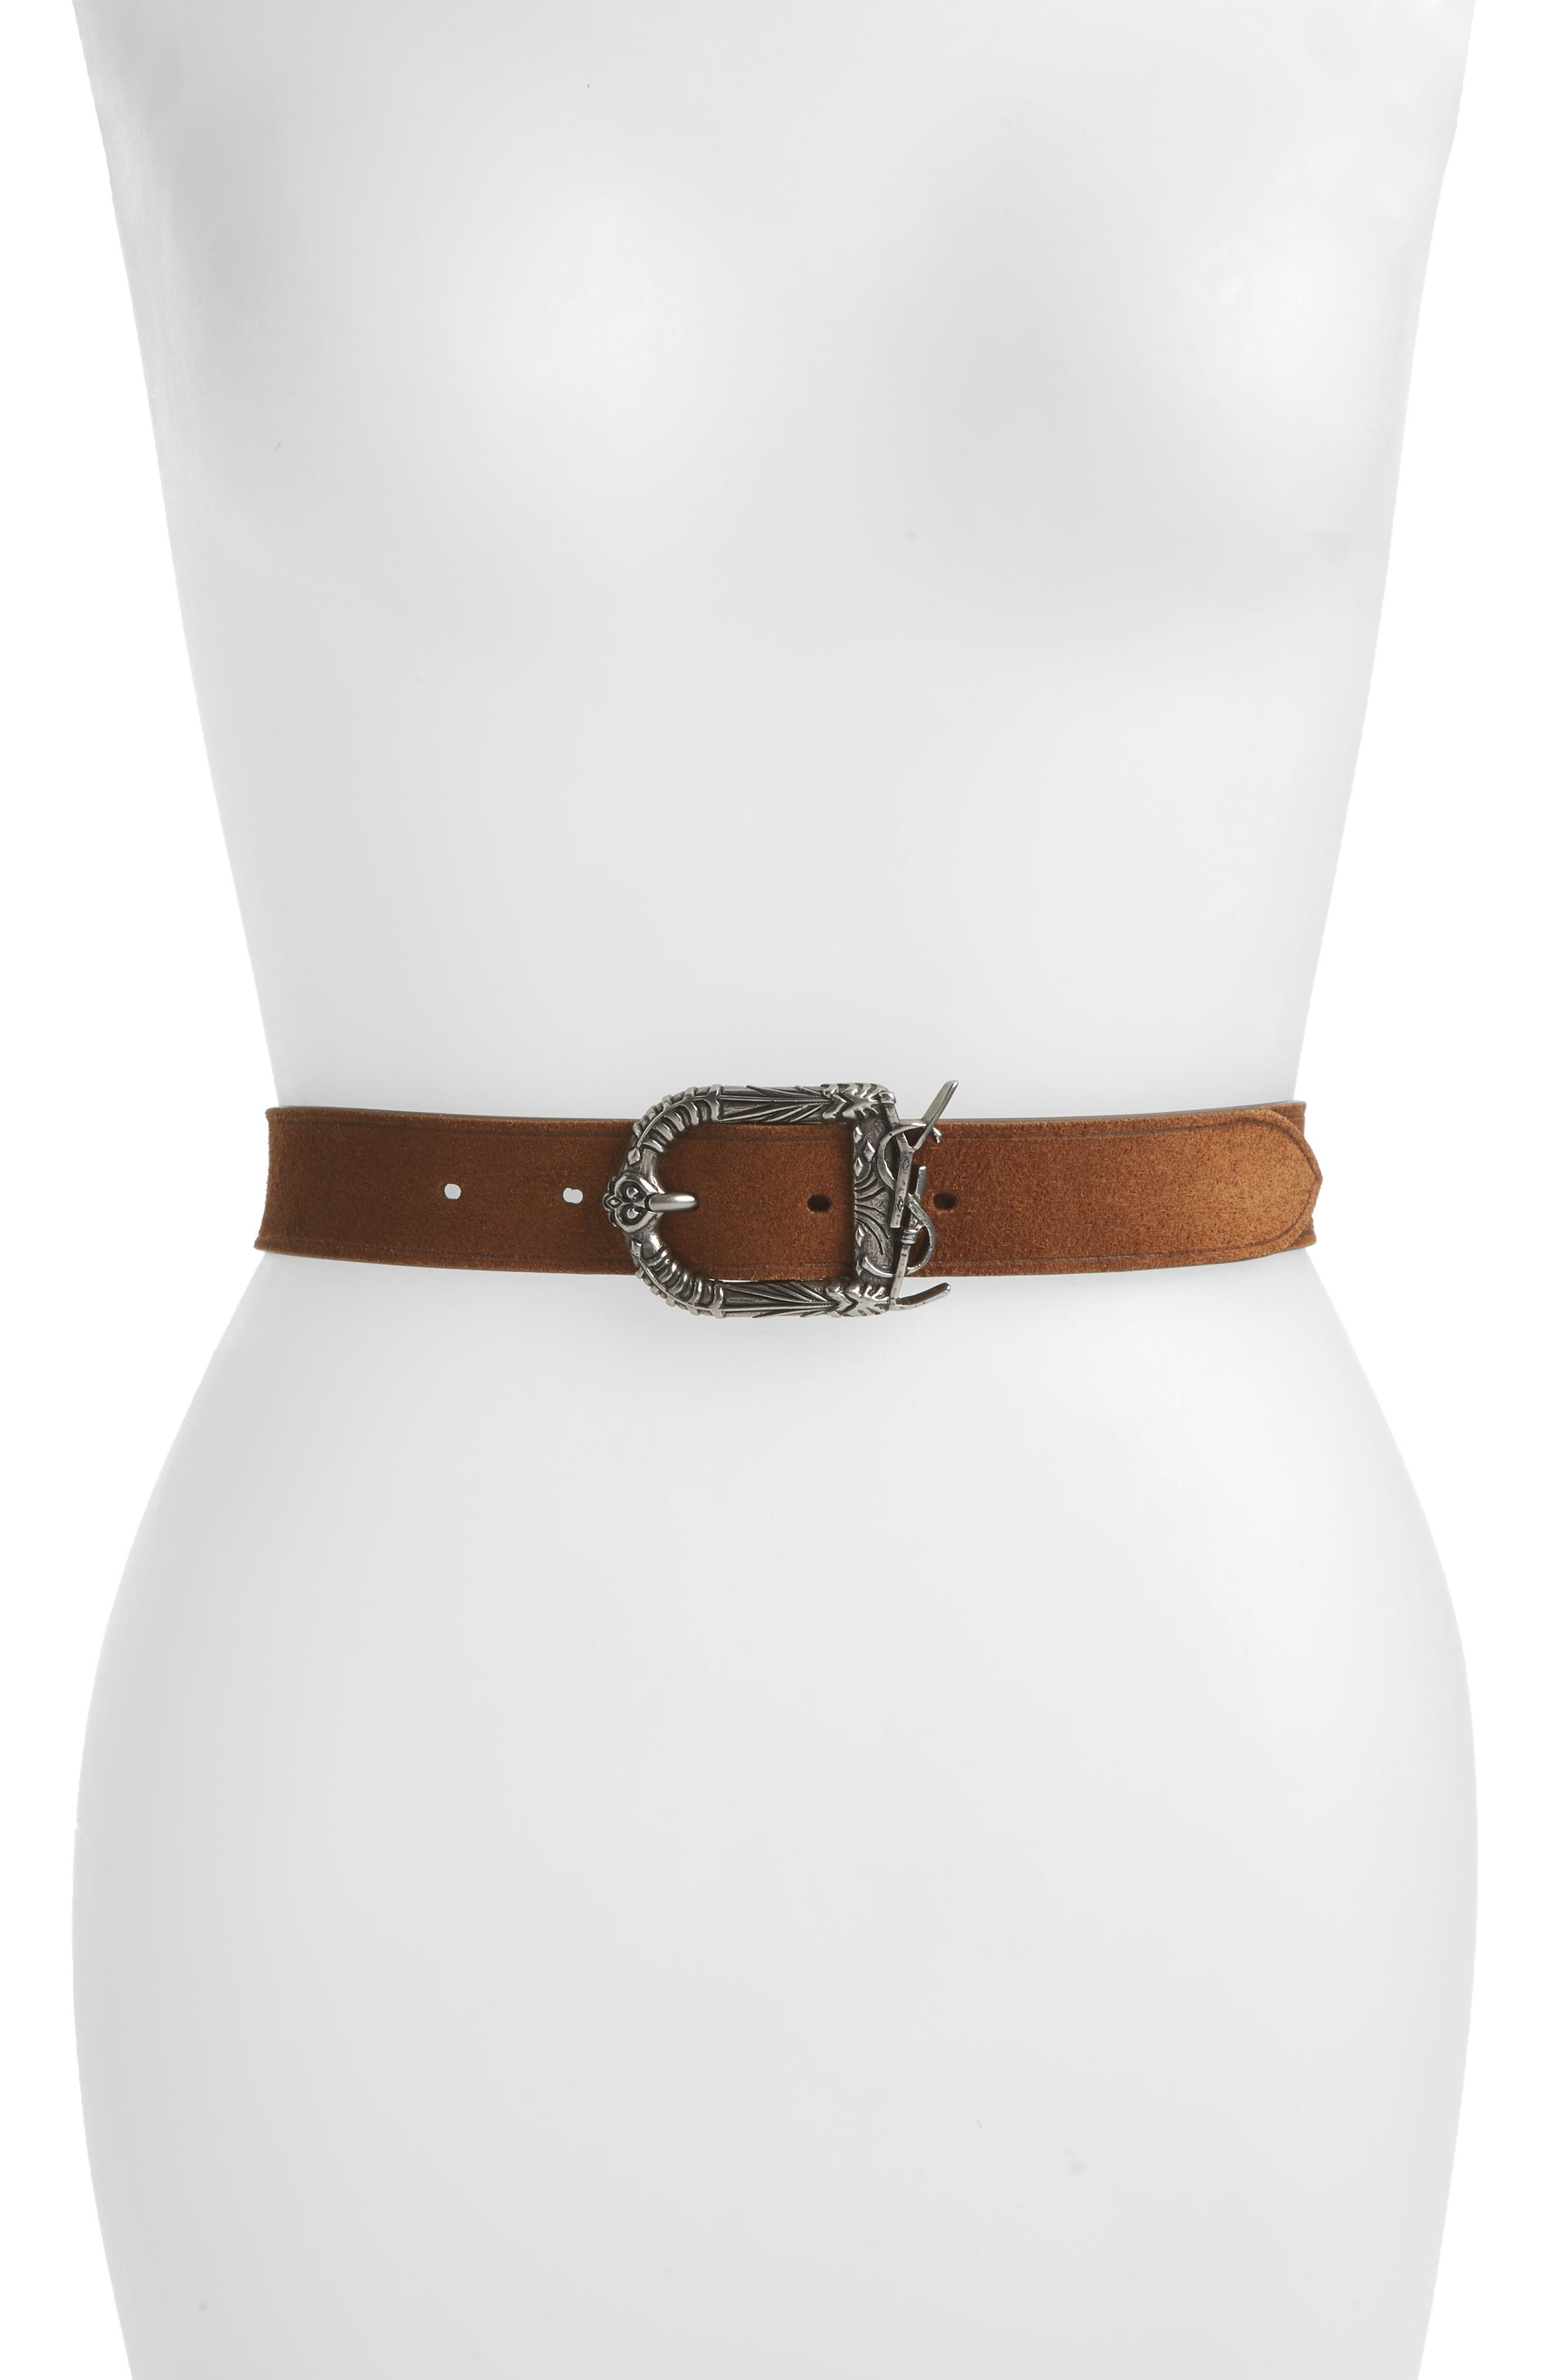 Saint Laurent Celtic Monogram Leather Belt, Moka Tan